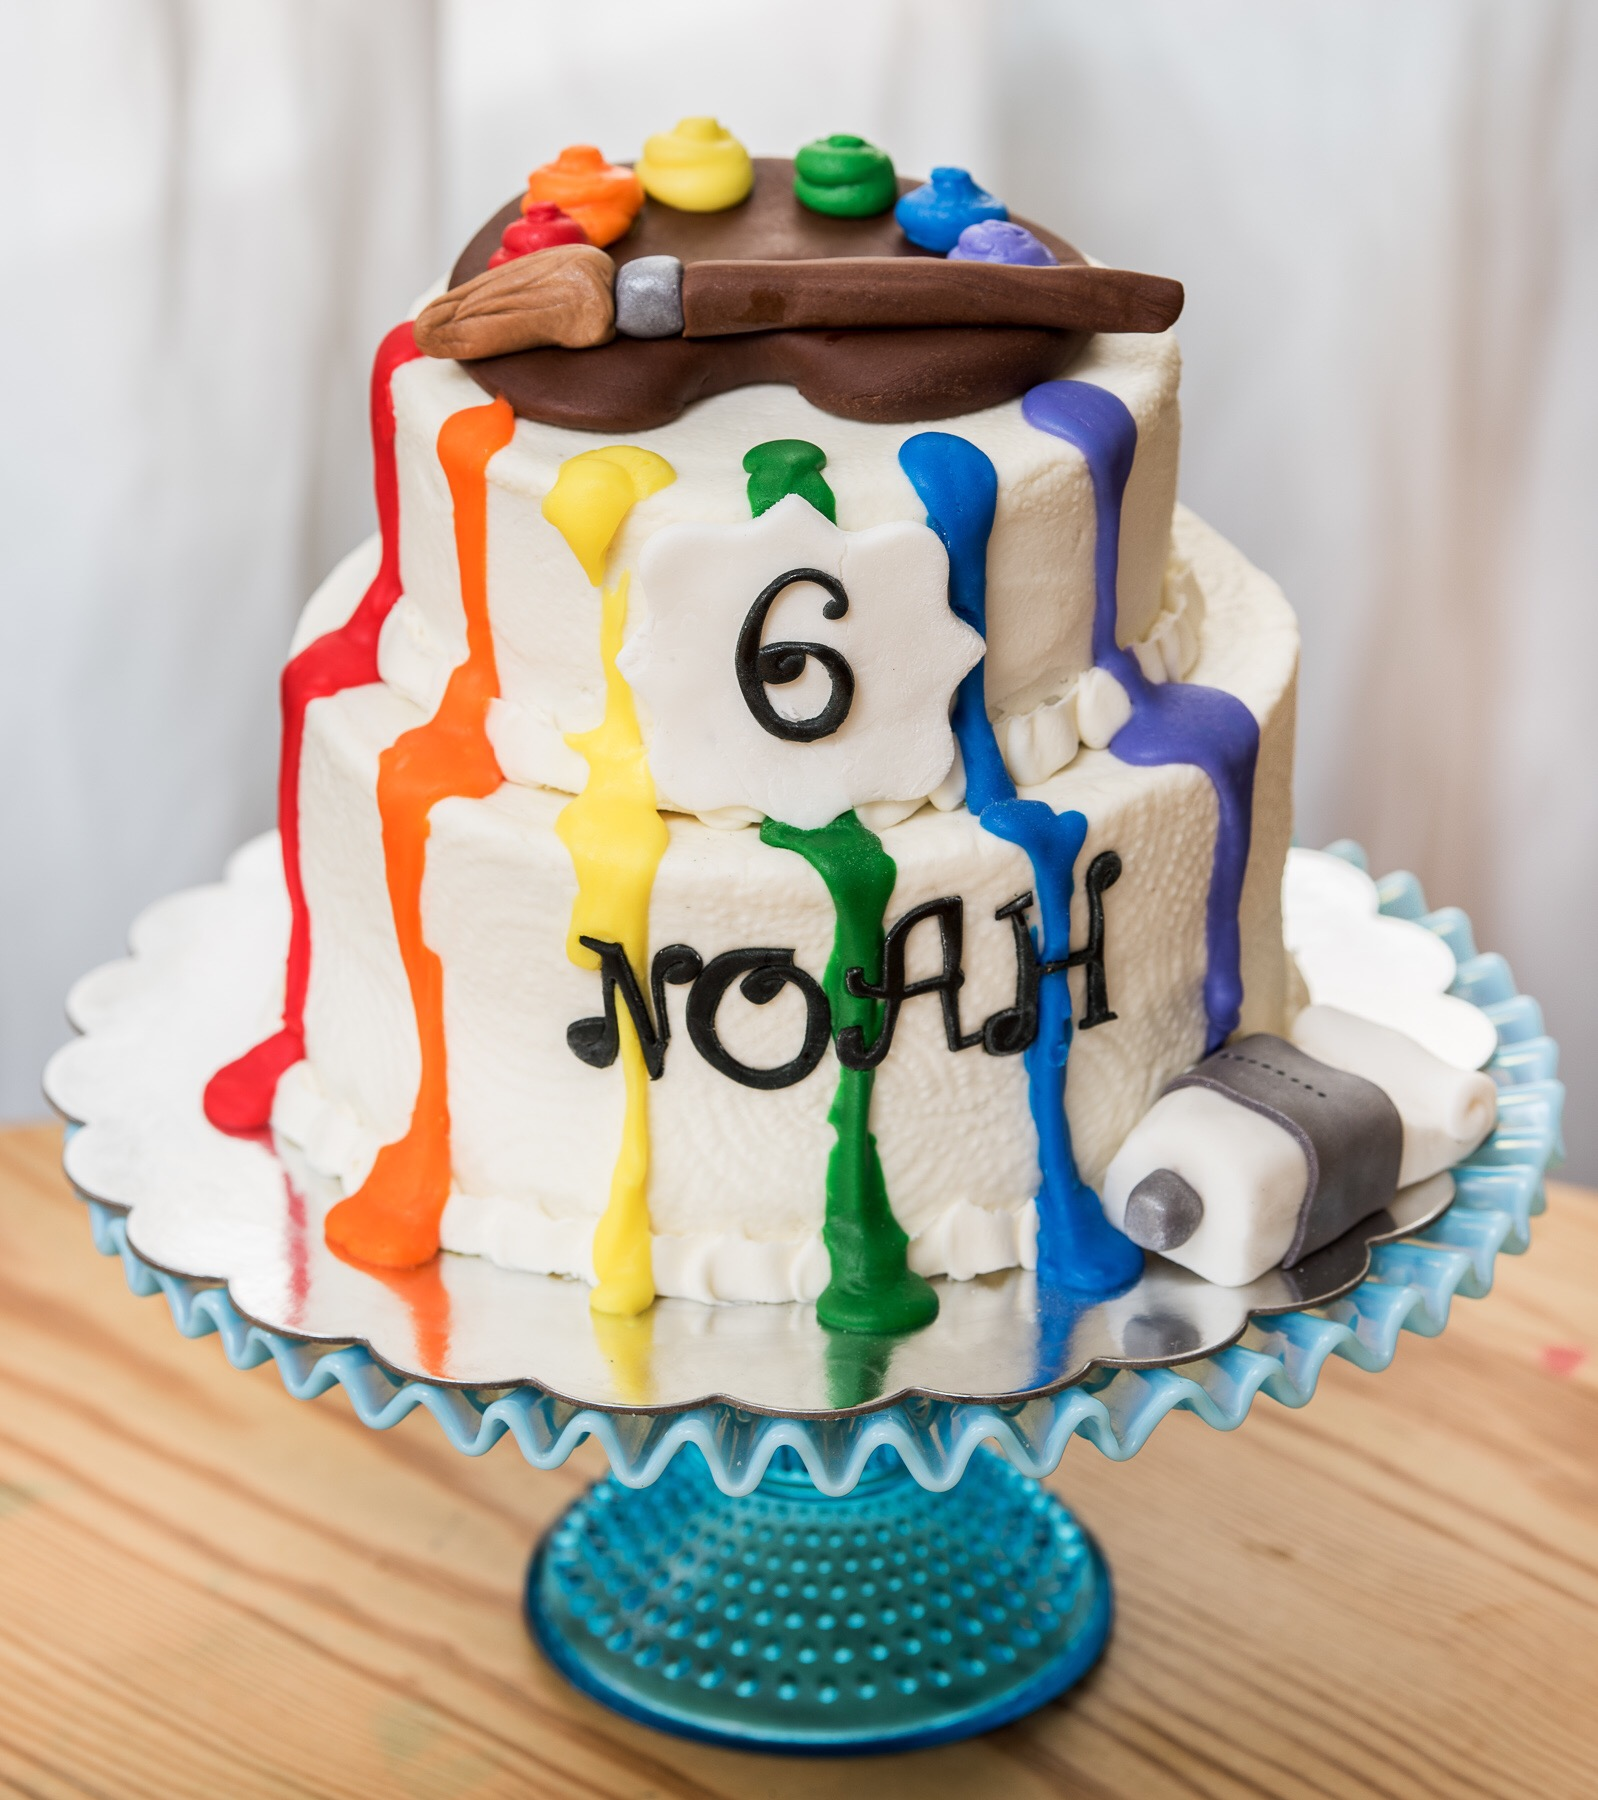 Aspen Street Cakes Custom cakes in Washington DC